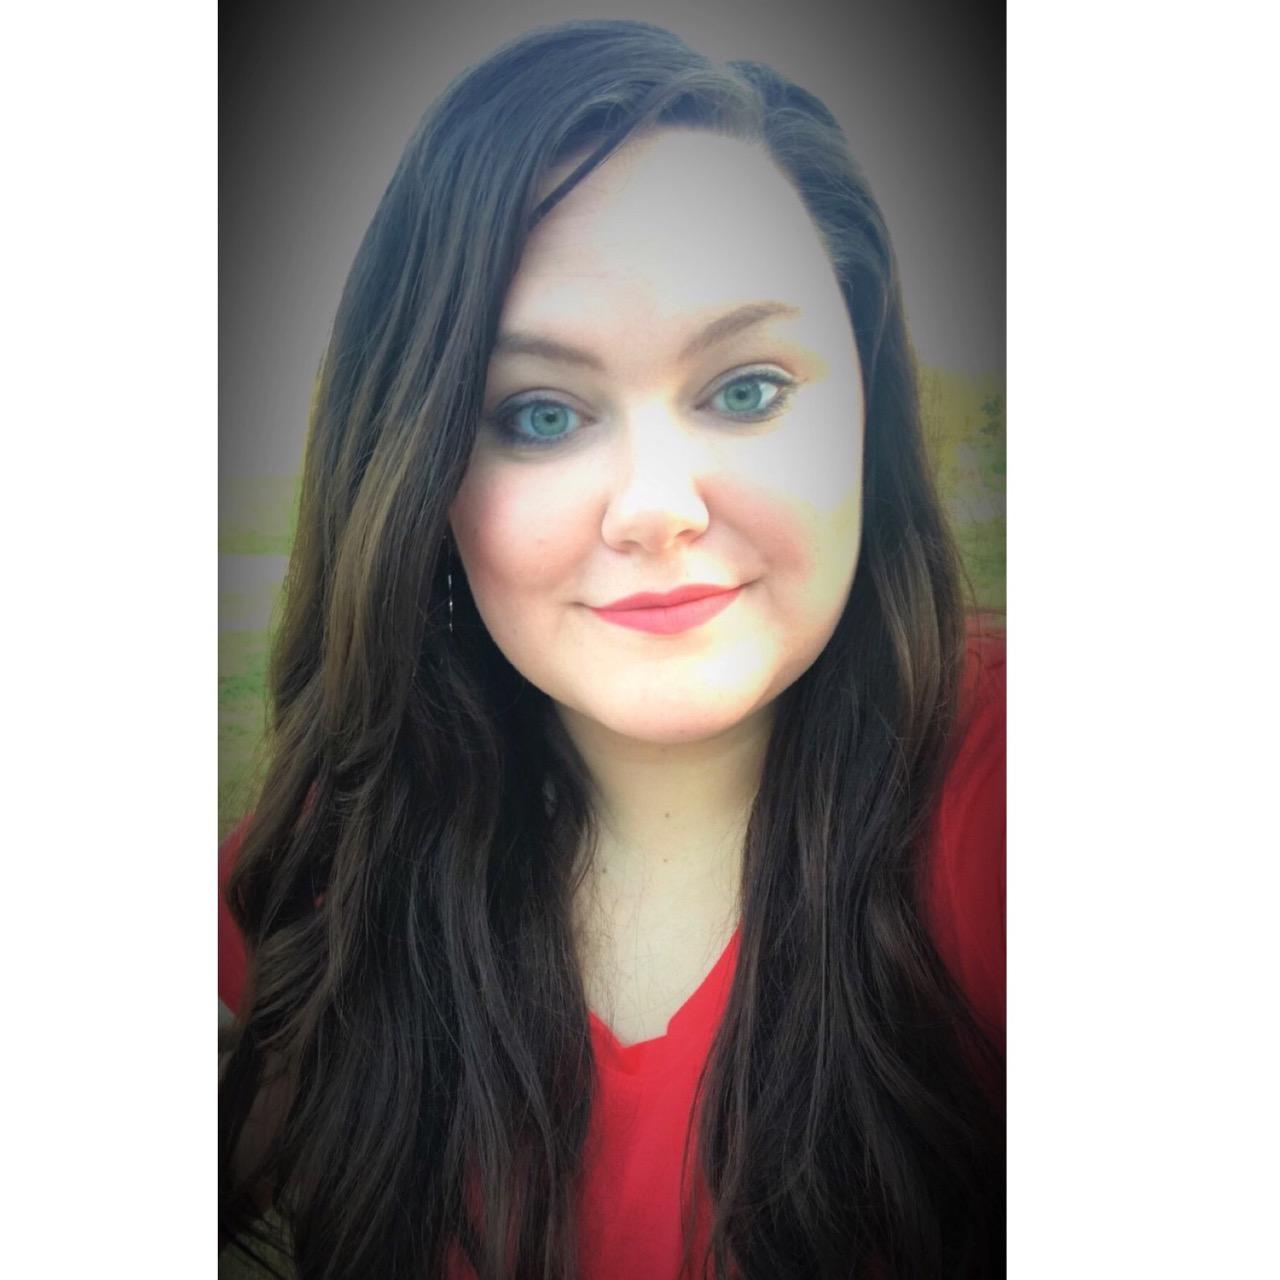 Megan Burleson